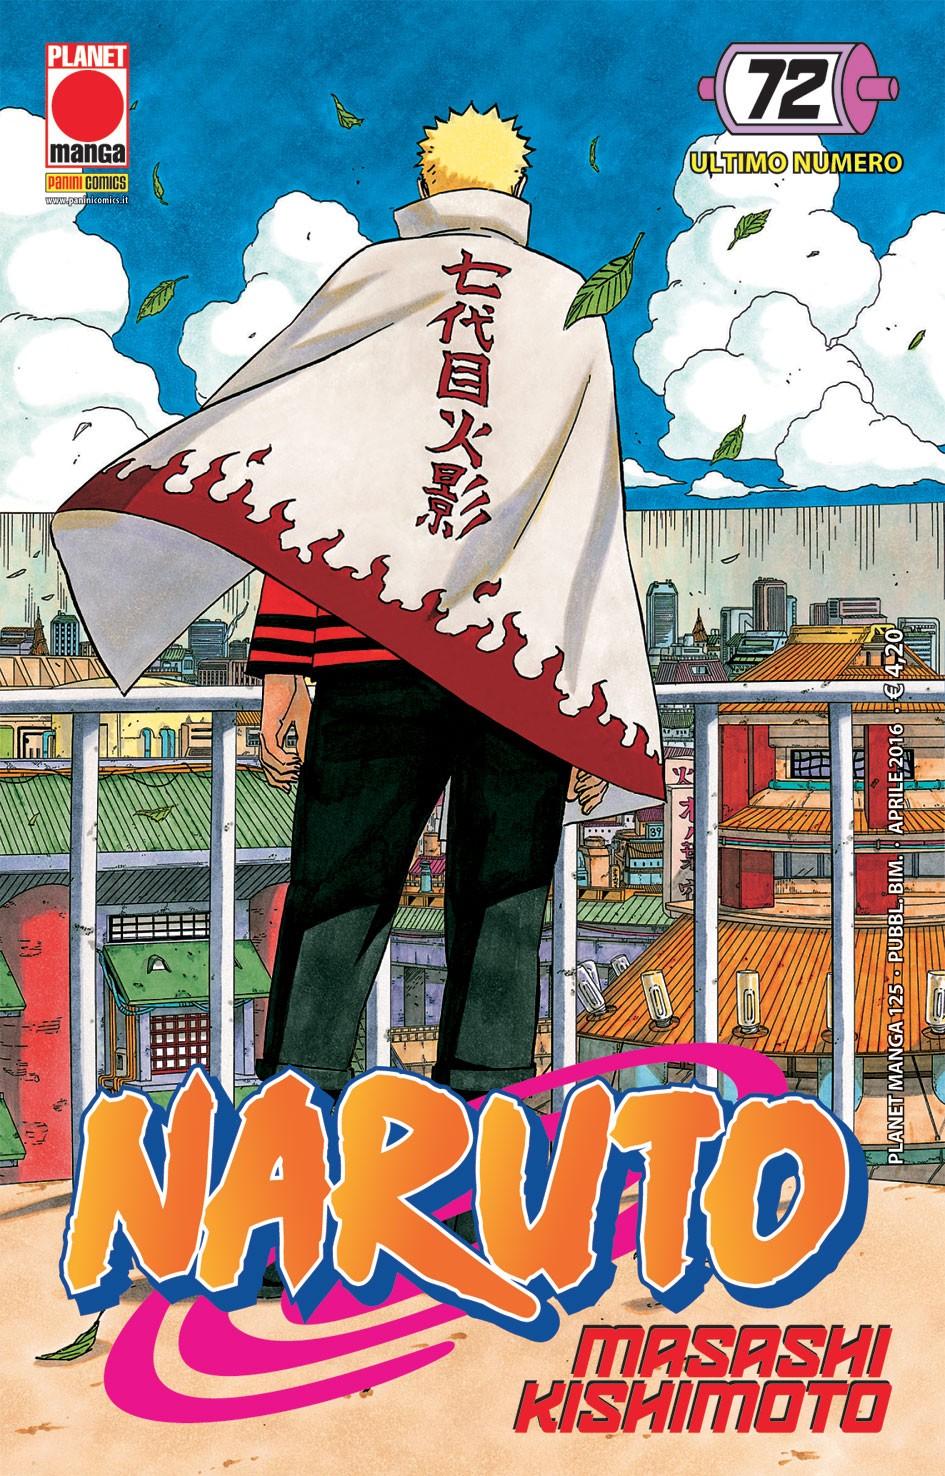 Naruto - N° 72 - Naruto - Planet Manga Planet Manga